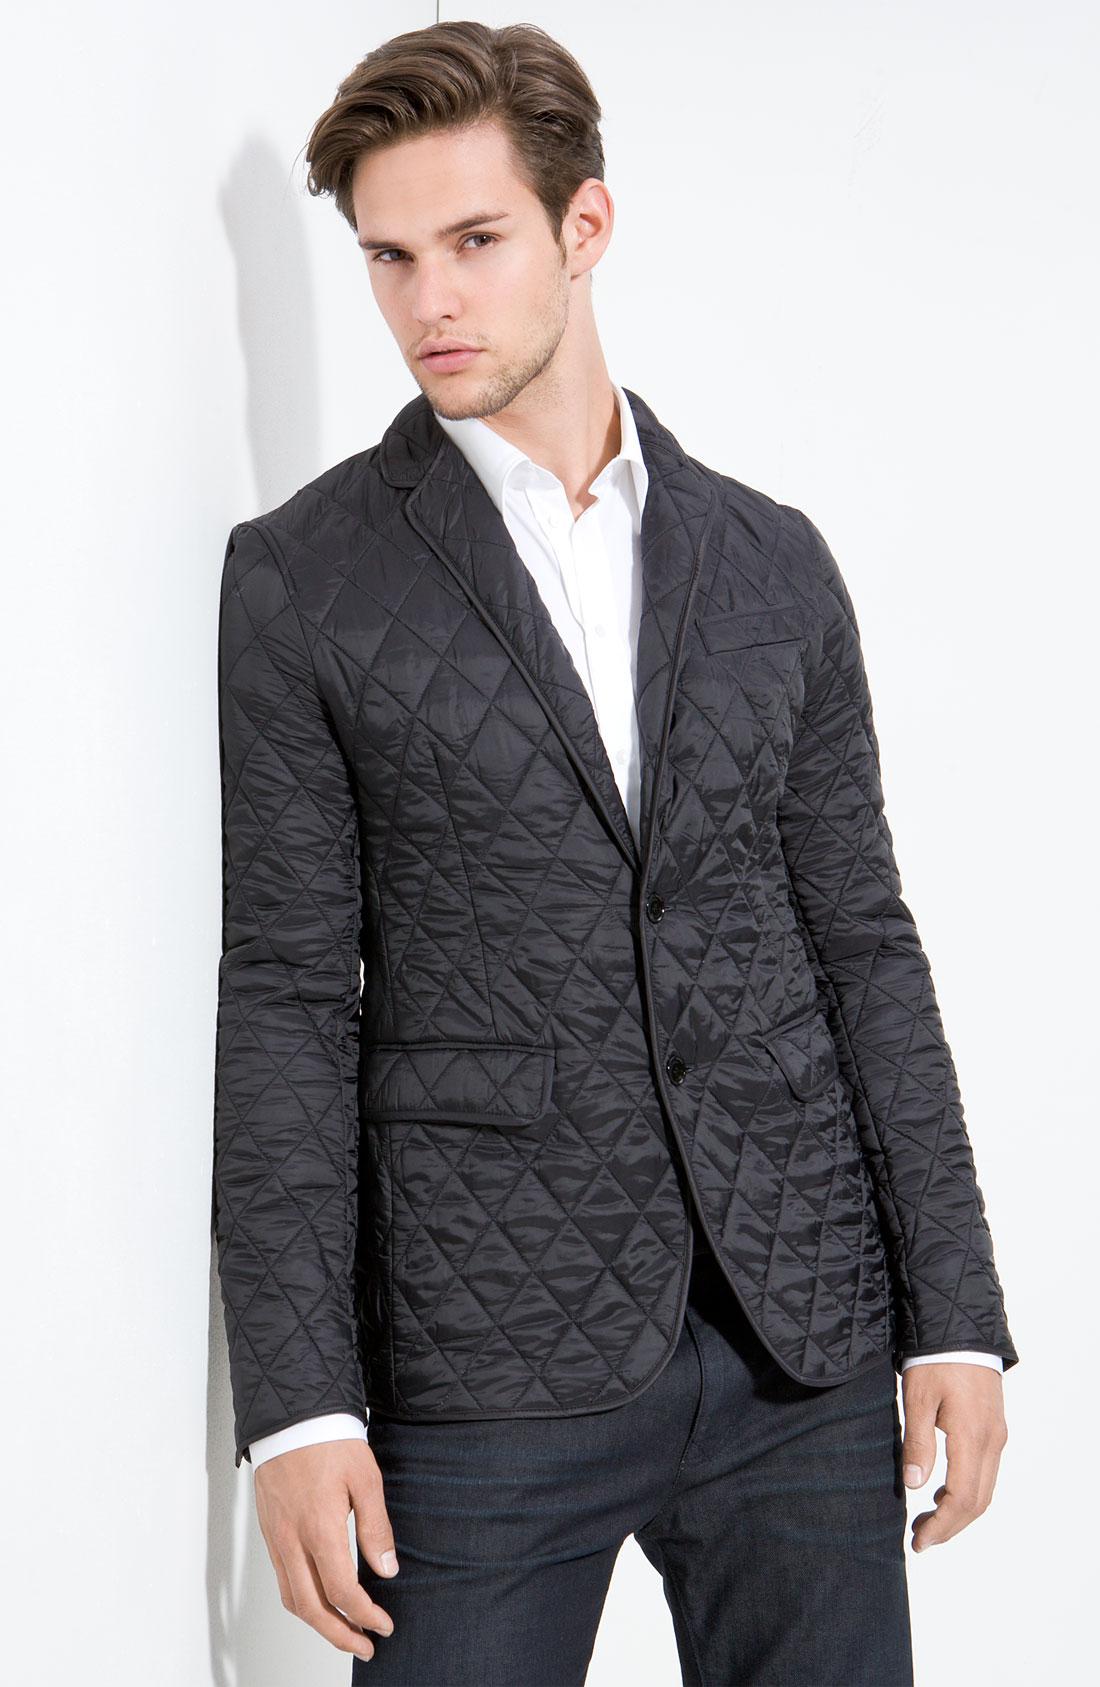 Lyst - Burberry Quilted Blazer in Black for Men : quilted blazer - Adamdwight.com